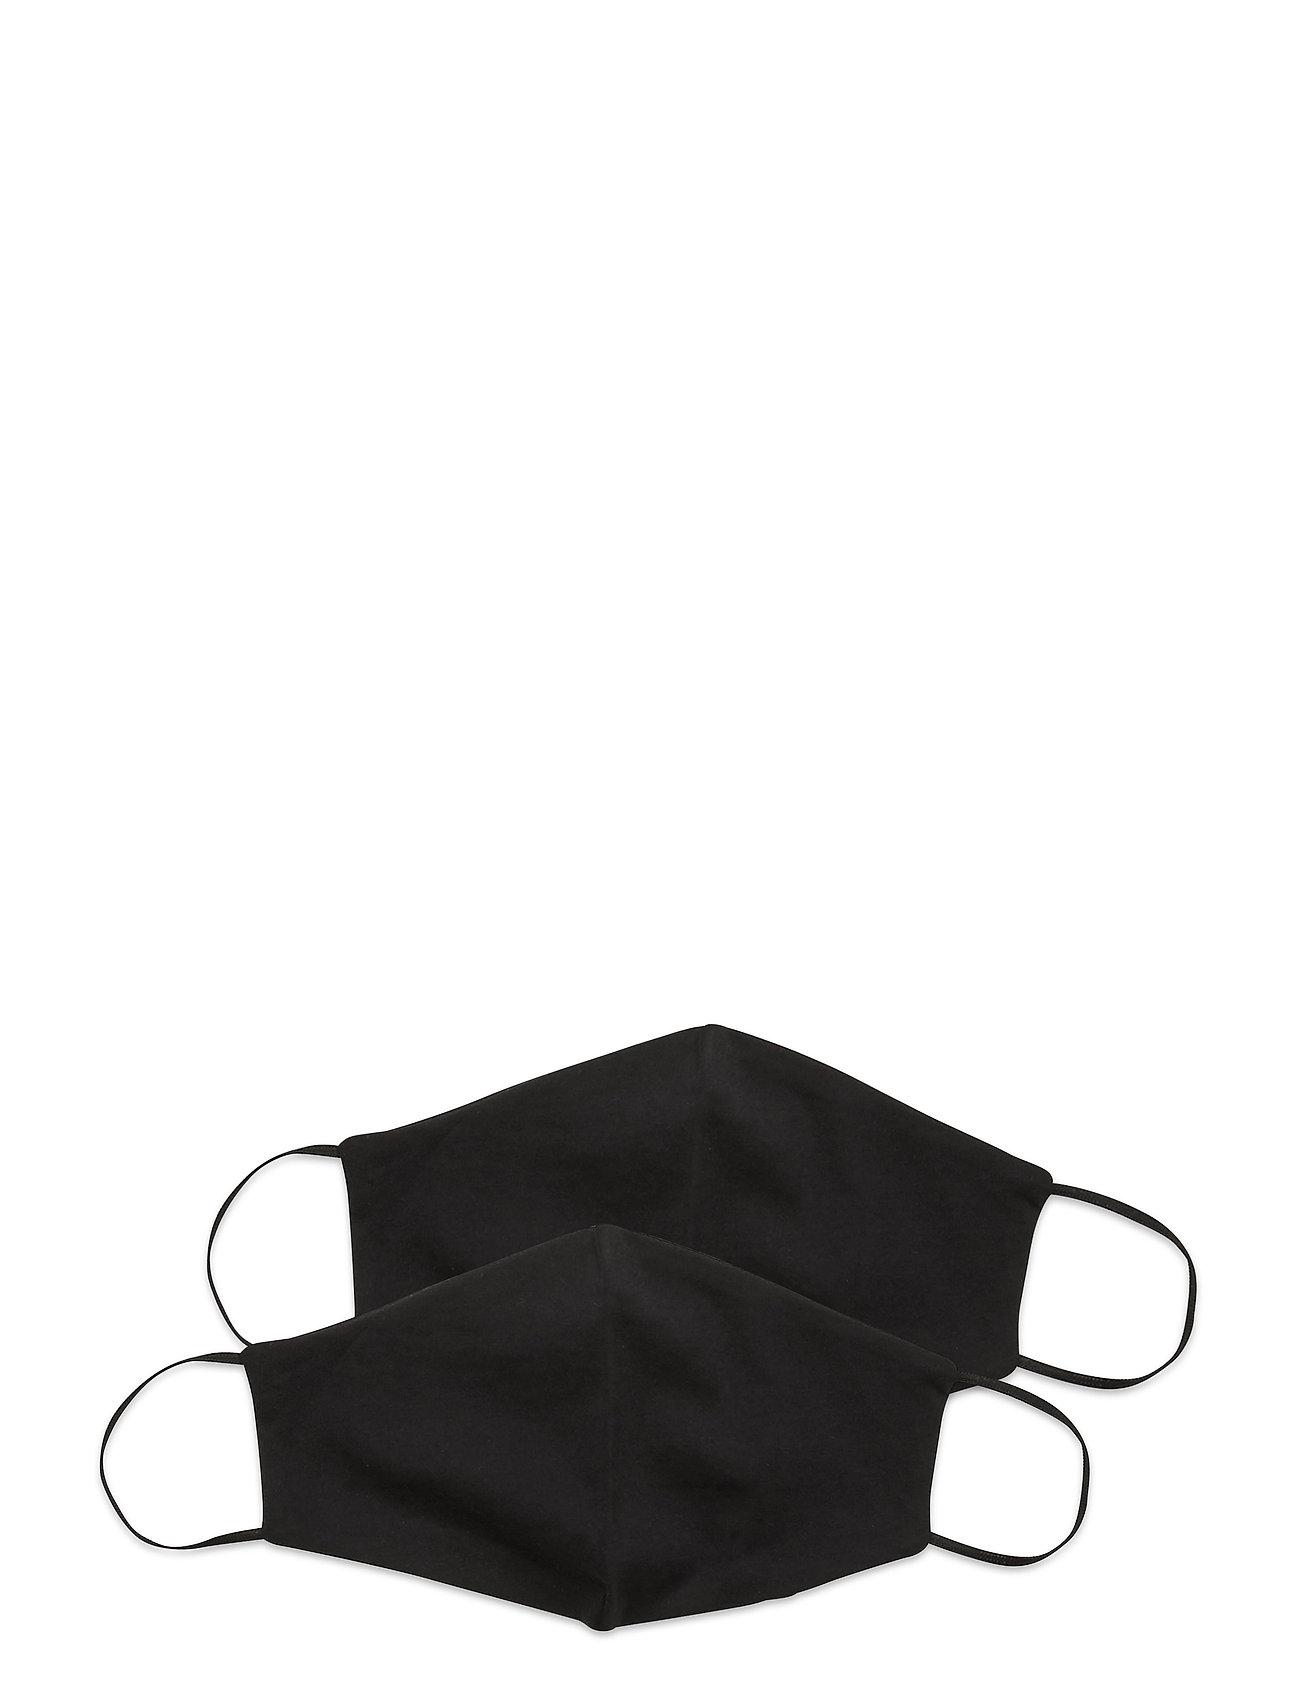 Image of Reusable Face Mask,2 Pack, Kids 2-10 Accessories Face Masks Sort ORAS24 (3417269195)